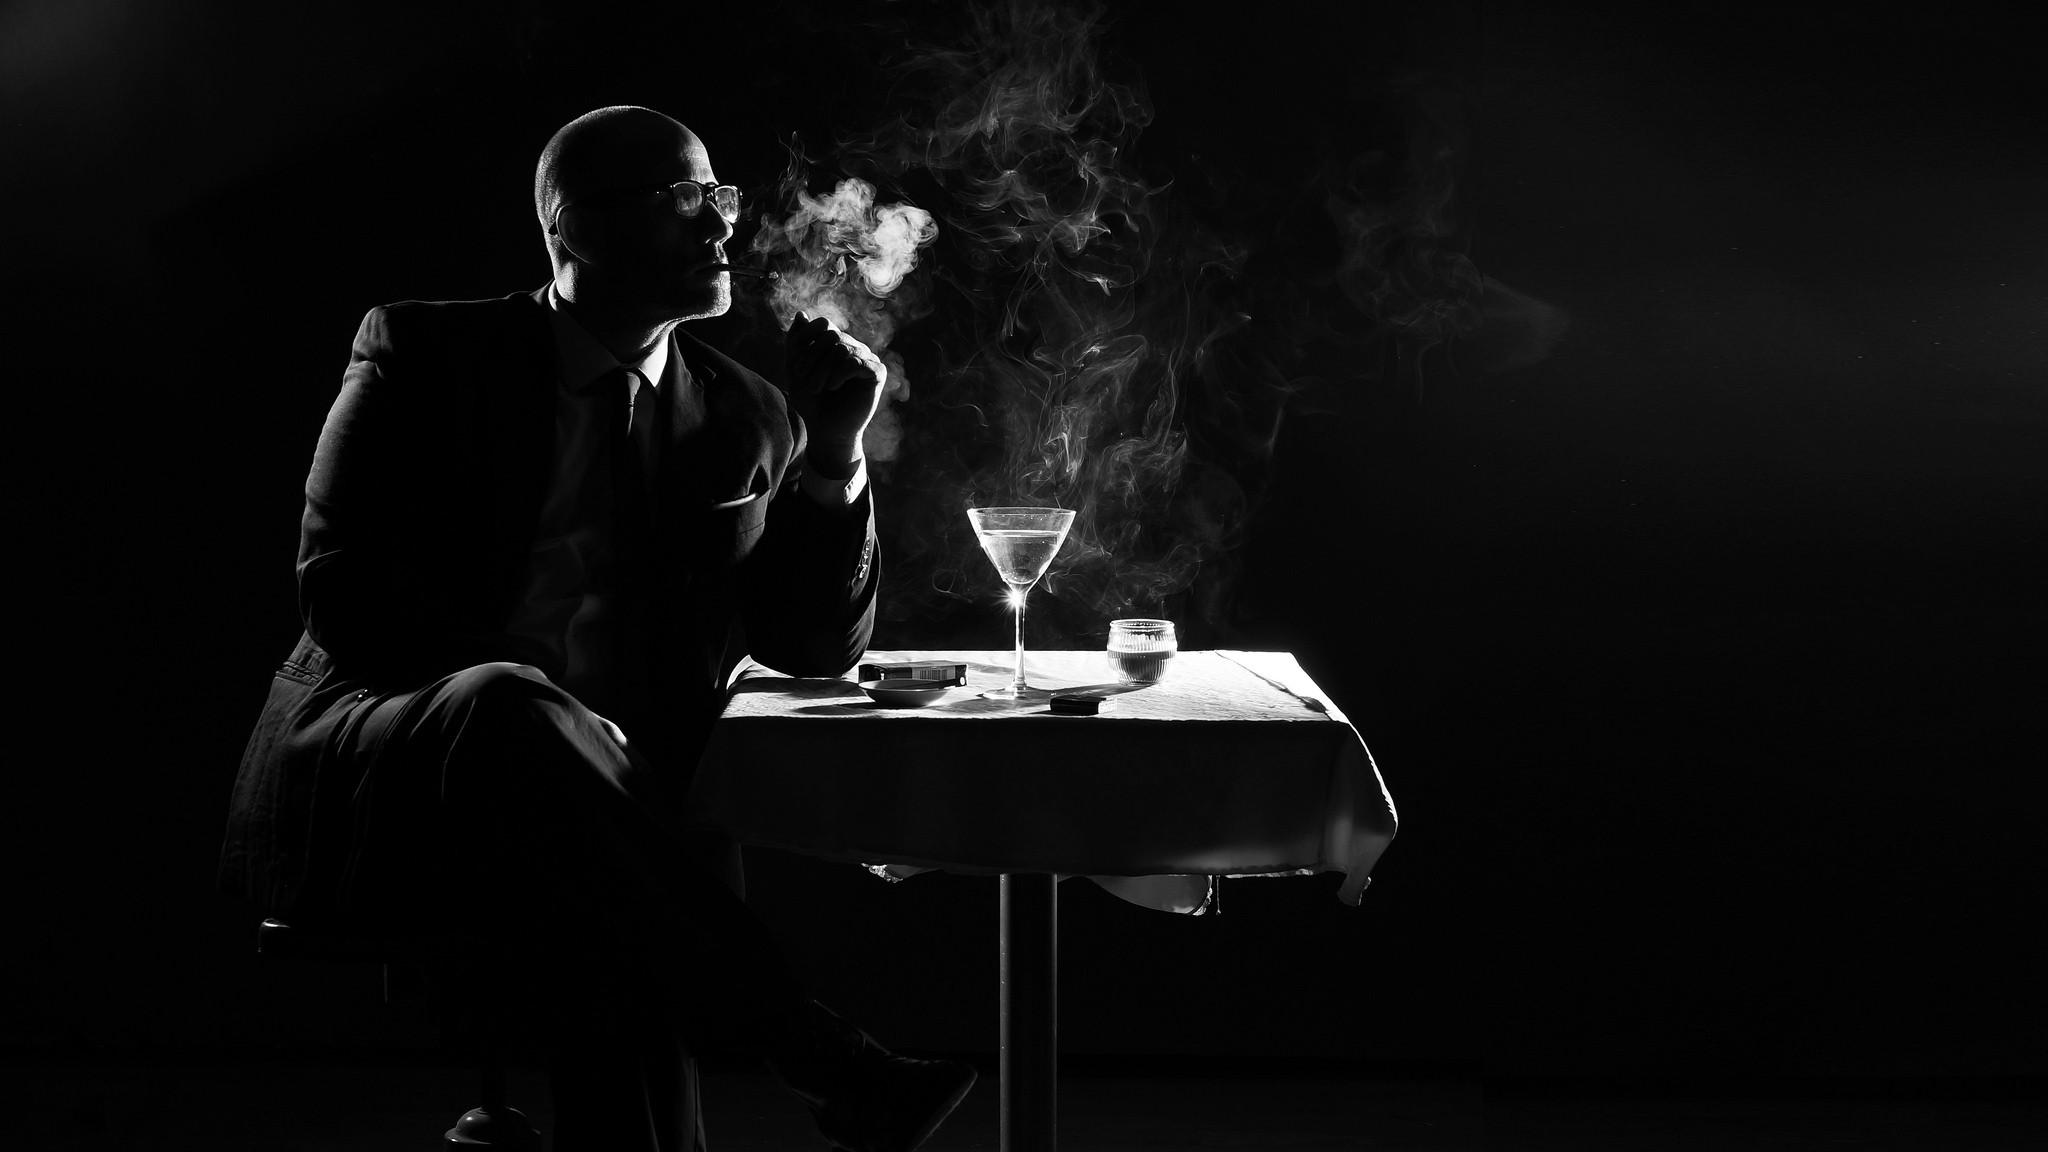 Men People Black Monochrome Dark Photography Music Smoking Musician Guitarist Singing Entertainment Light Performance Stage Darkness